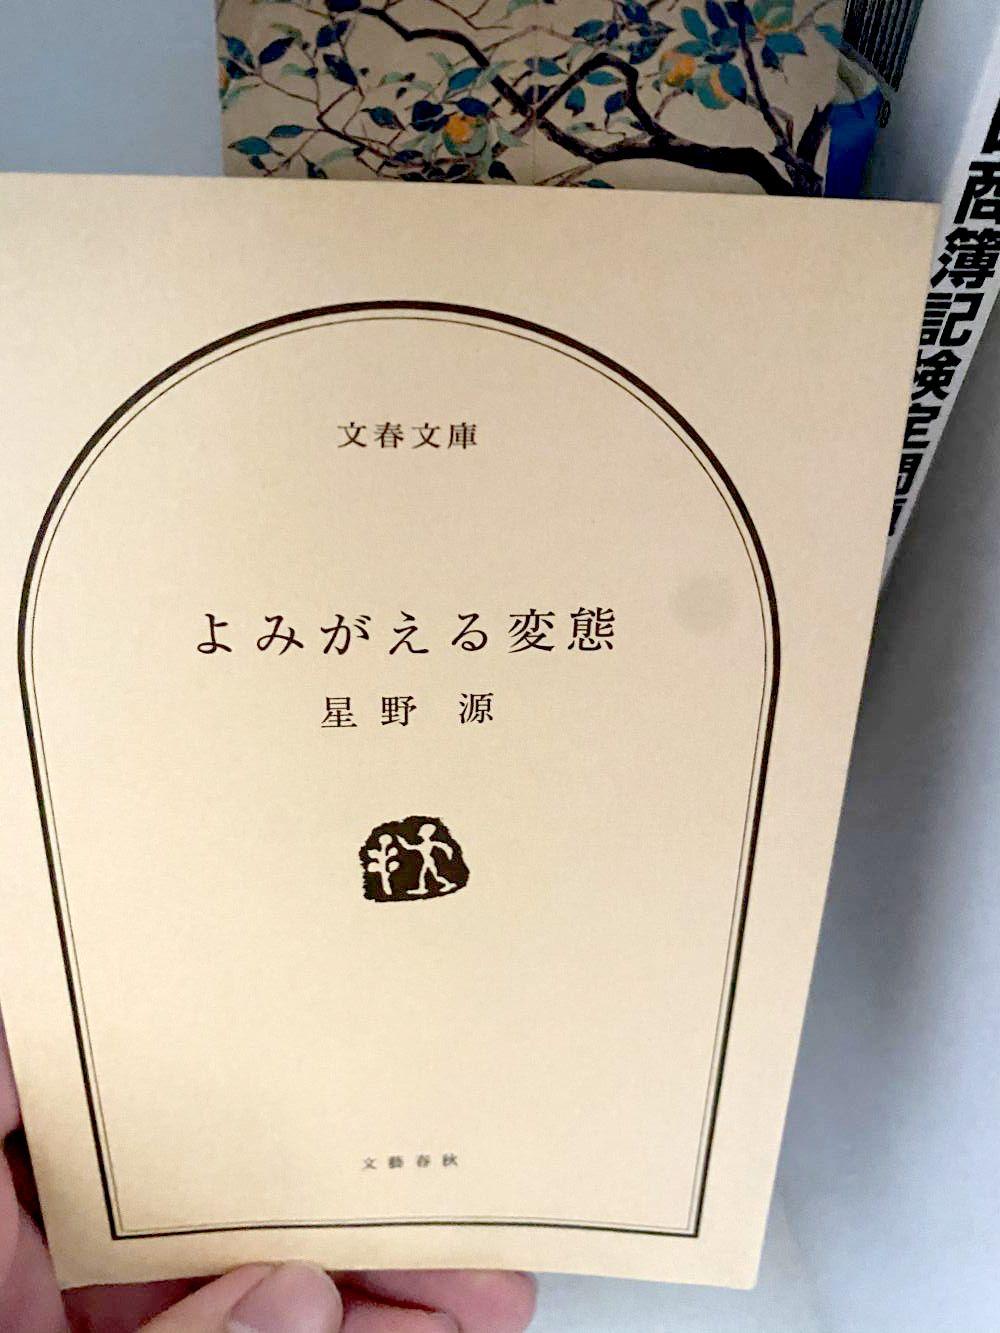 Dism 男 由来 髭 official